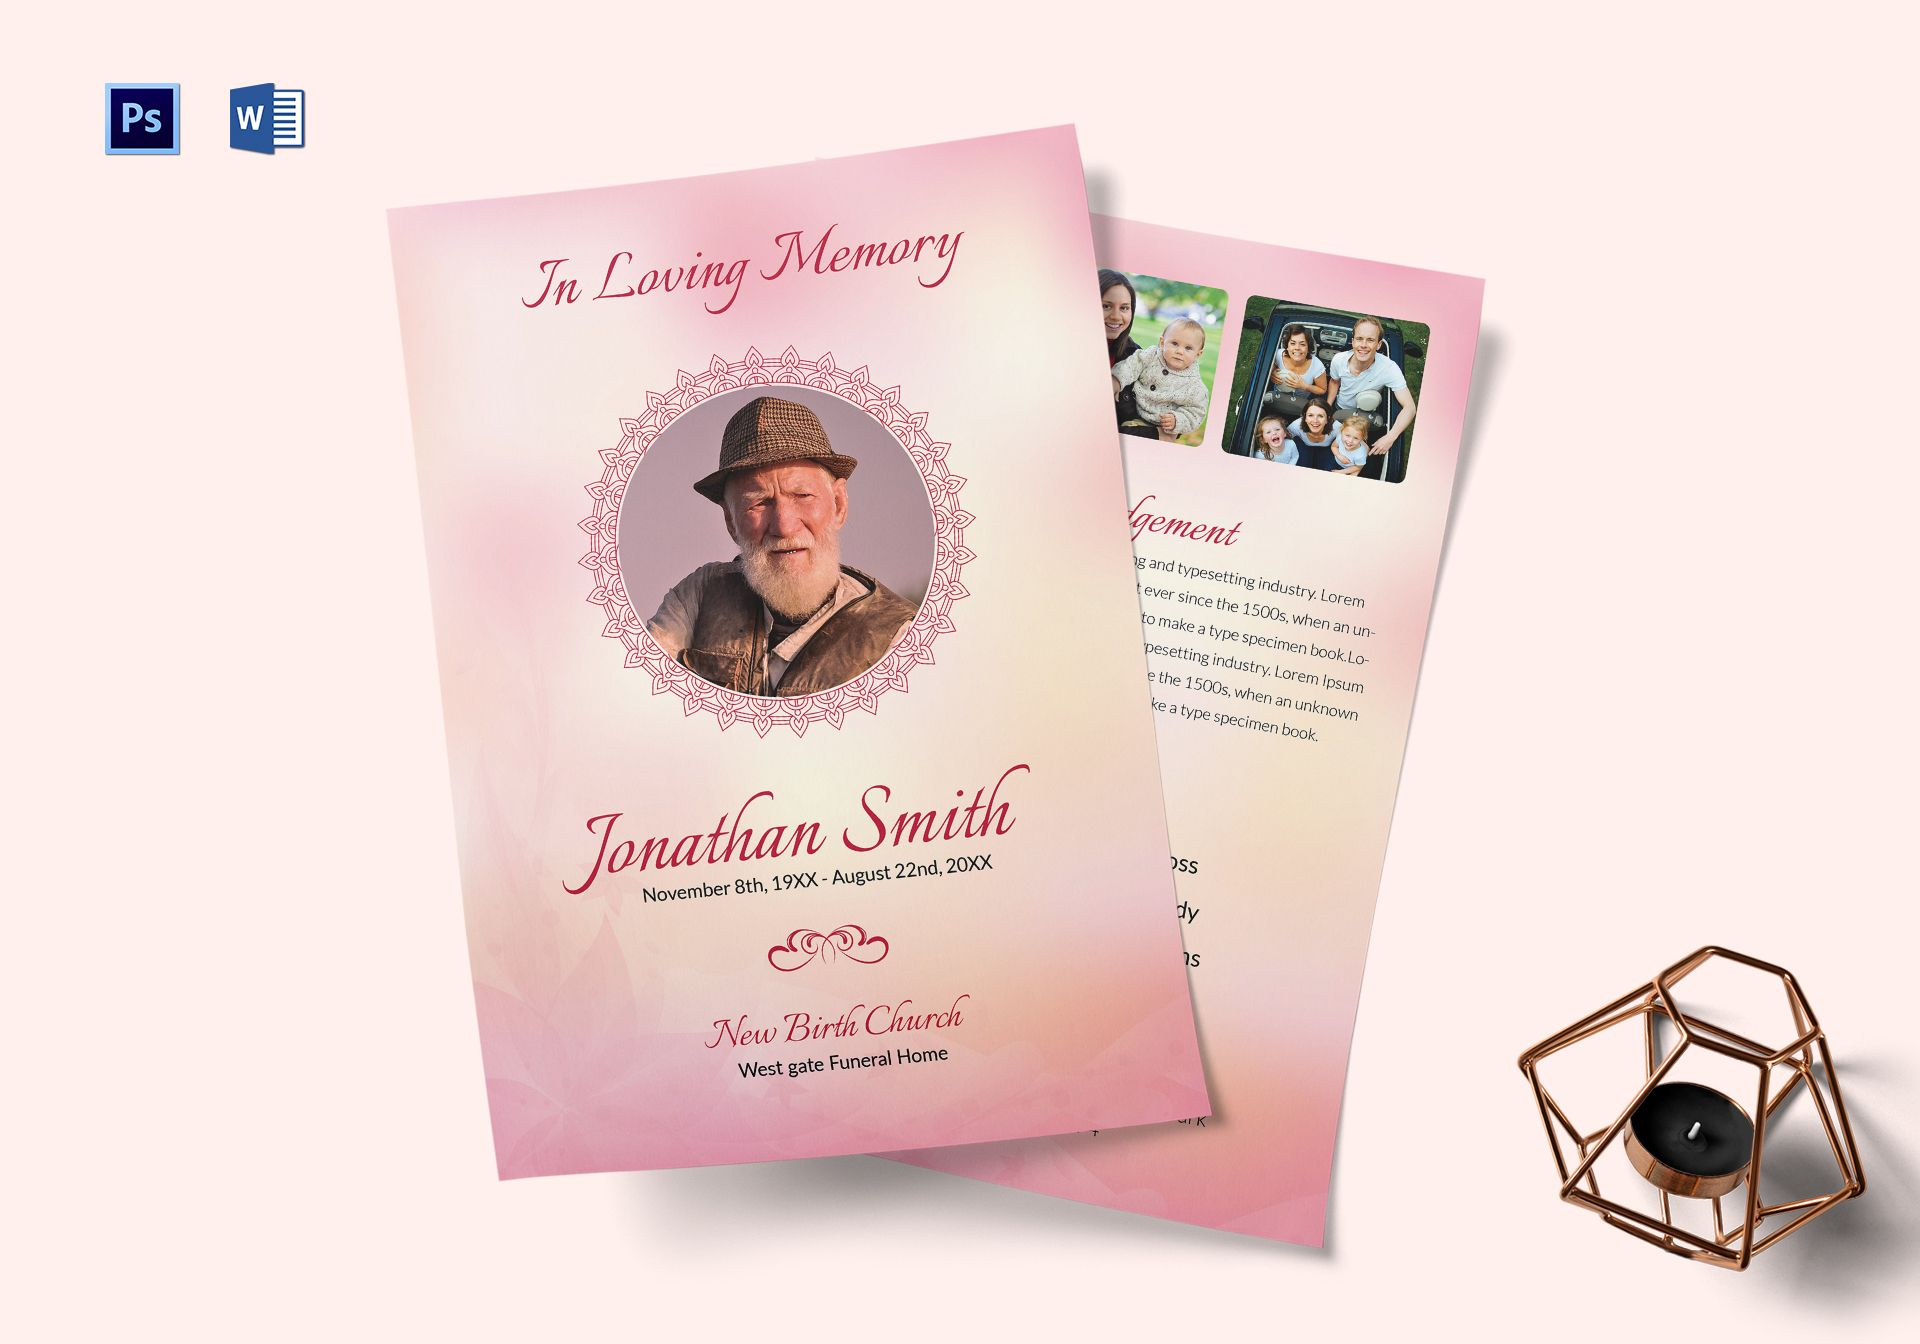 Catholic Funeral Service Program Template In Adobe Photoshop